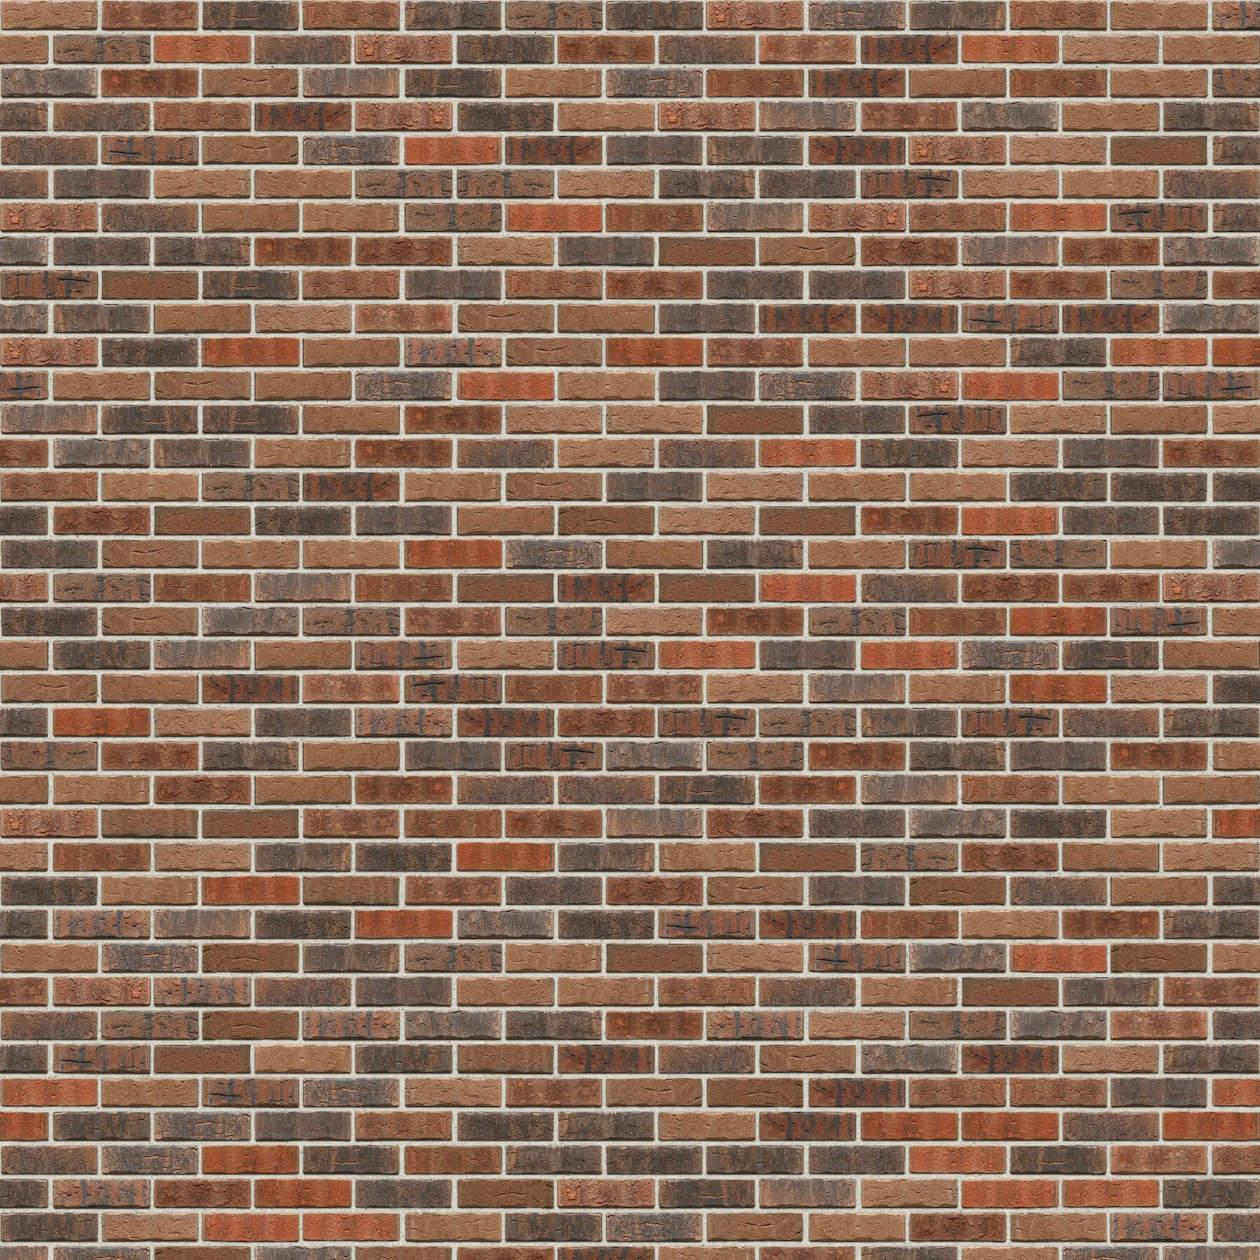 Puna-cigla-FeldHaus-Klinker-brick-house-nf-k-685-Bela Fuga